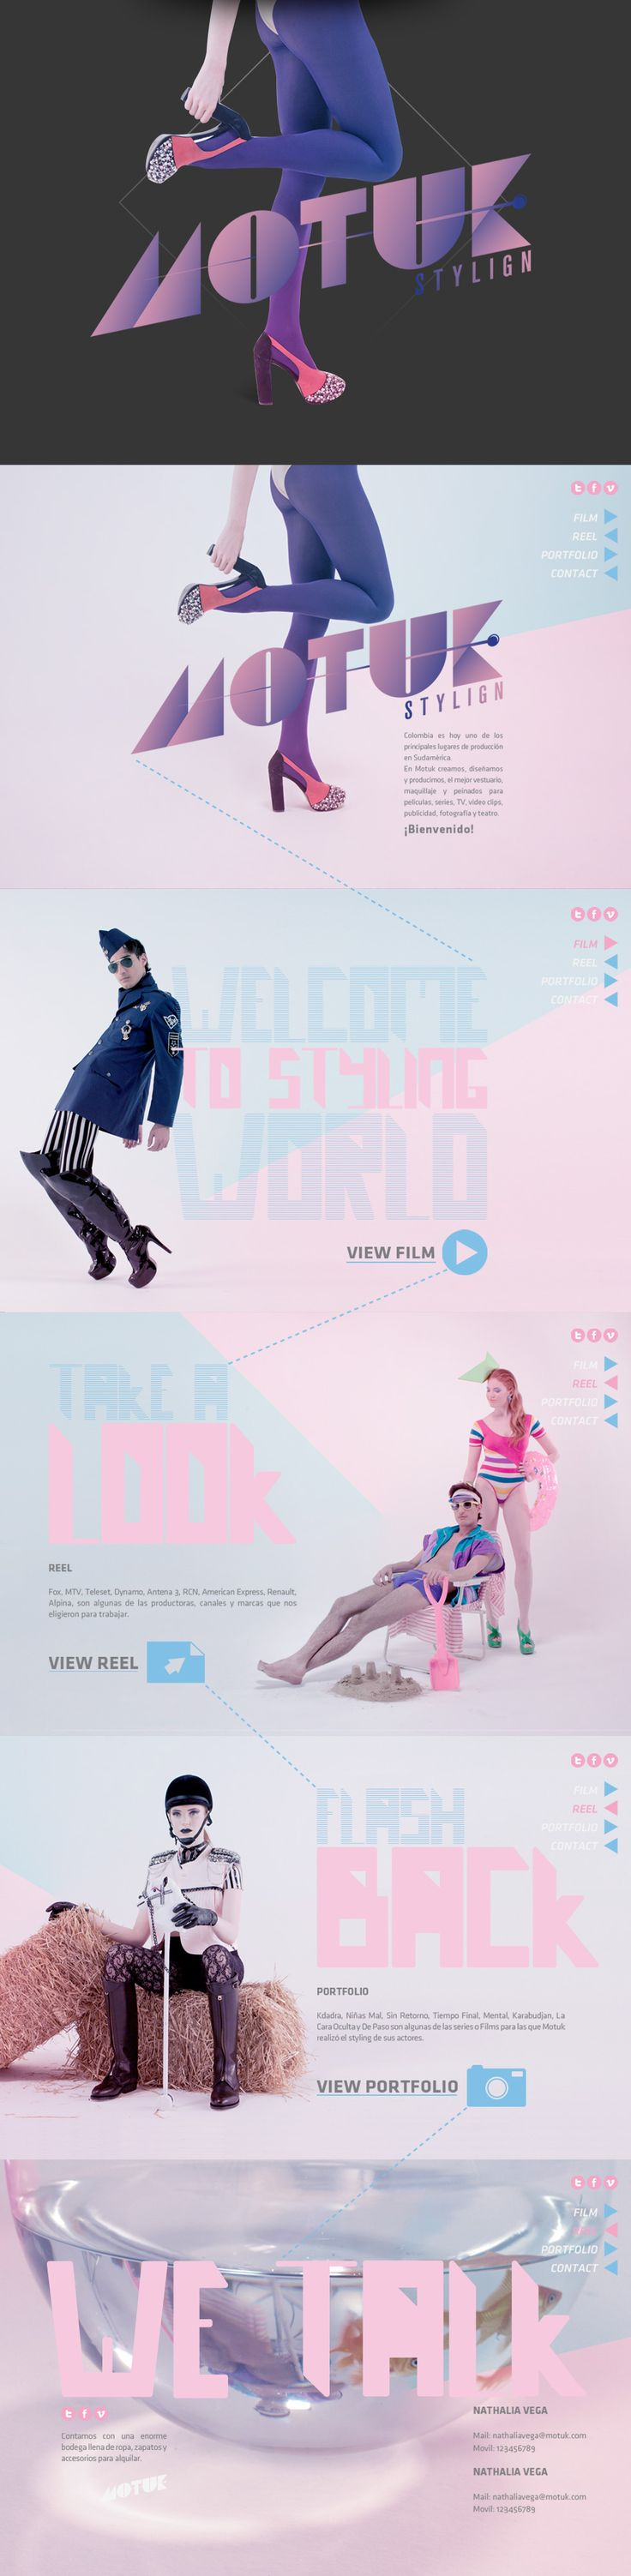 Motuk. Harmonic tone, stylish design. #webdesign (View more at www.aldenchong.com)